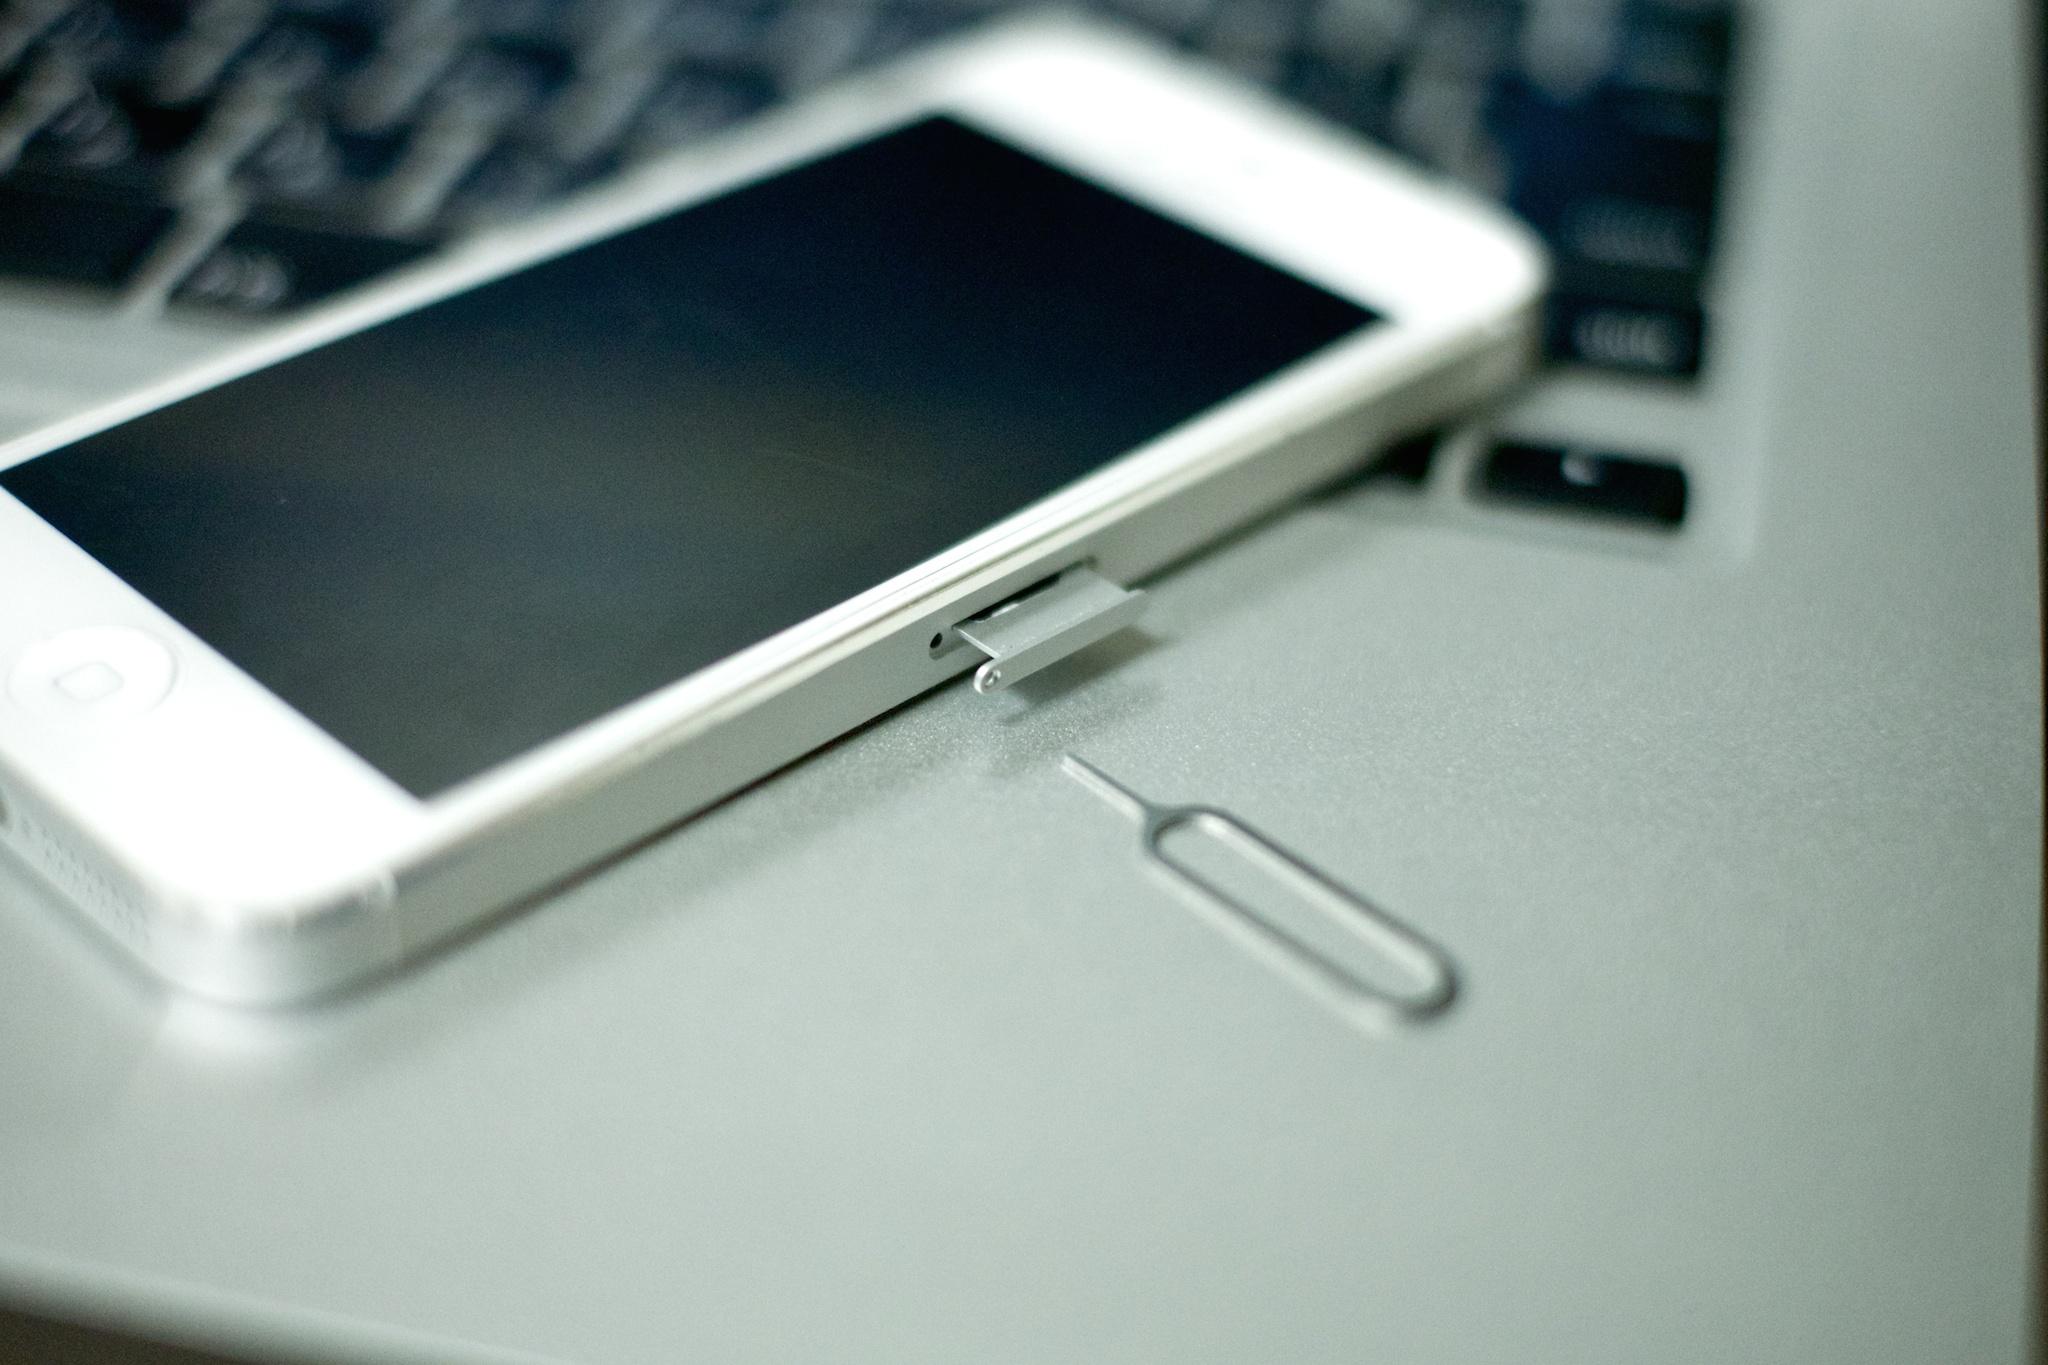 [iPhone6]iPhoneを下取りして貰う前に「水濡れチェック」をしてみたっ!